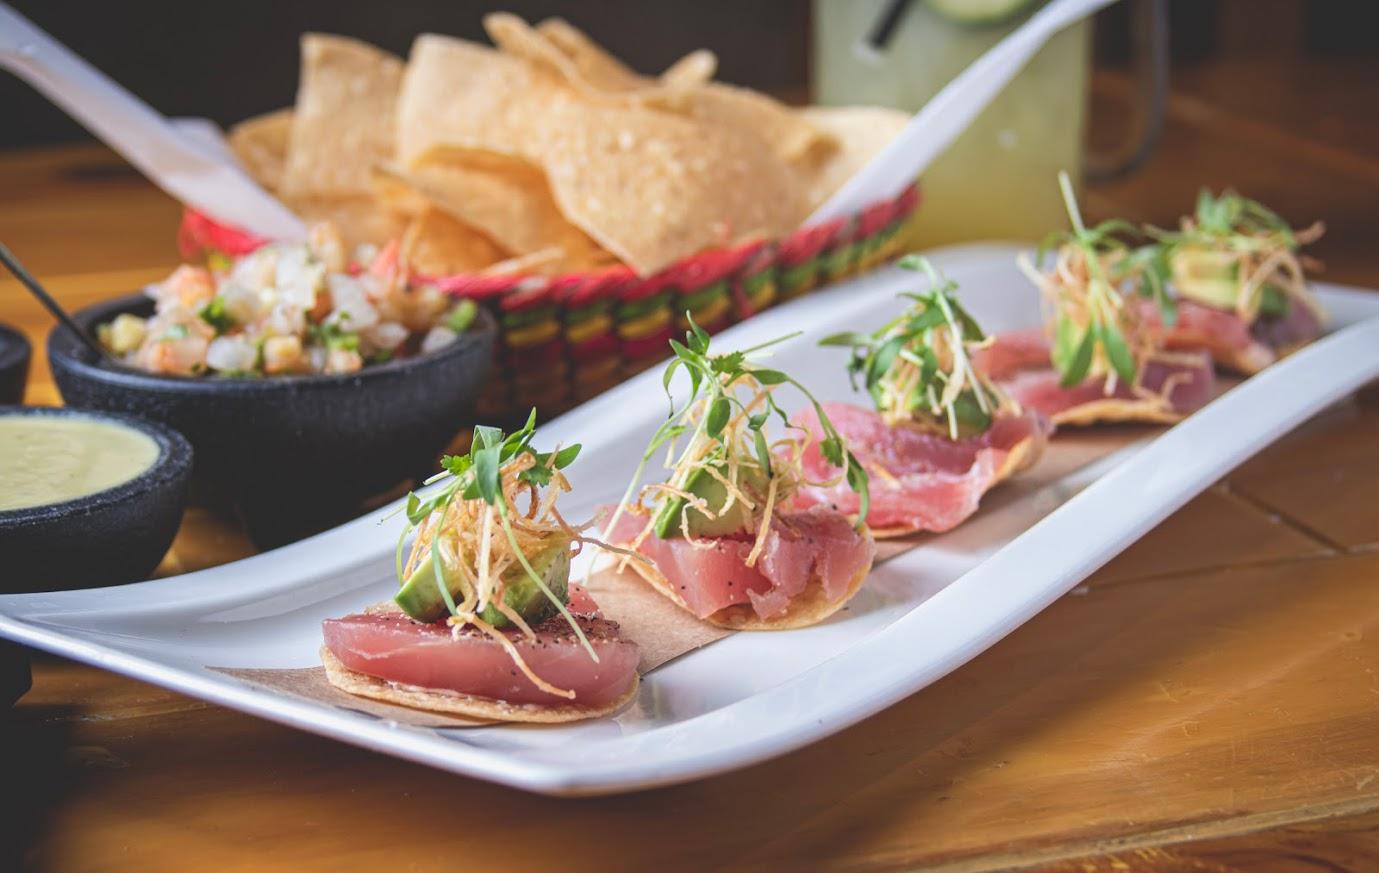 Tuna Tostado on the white plate